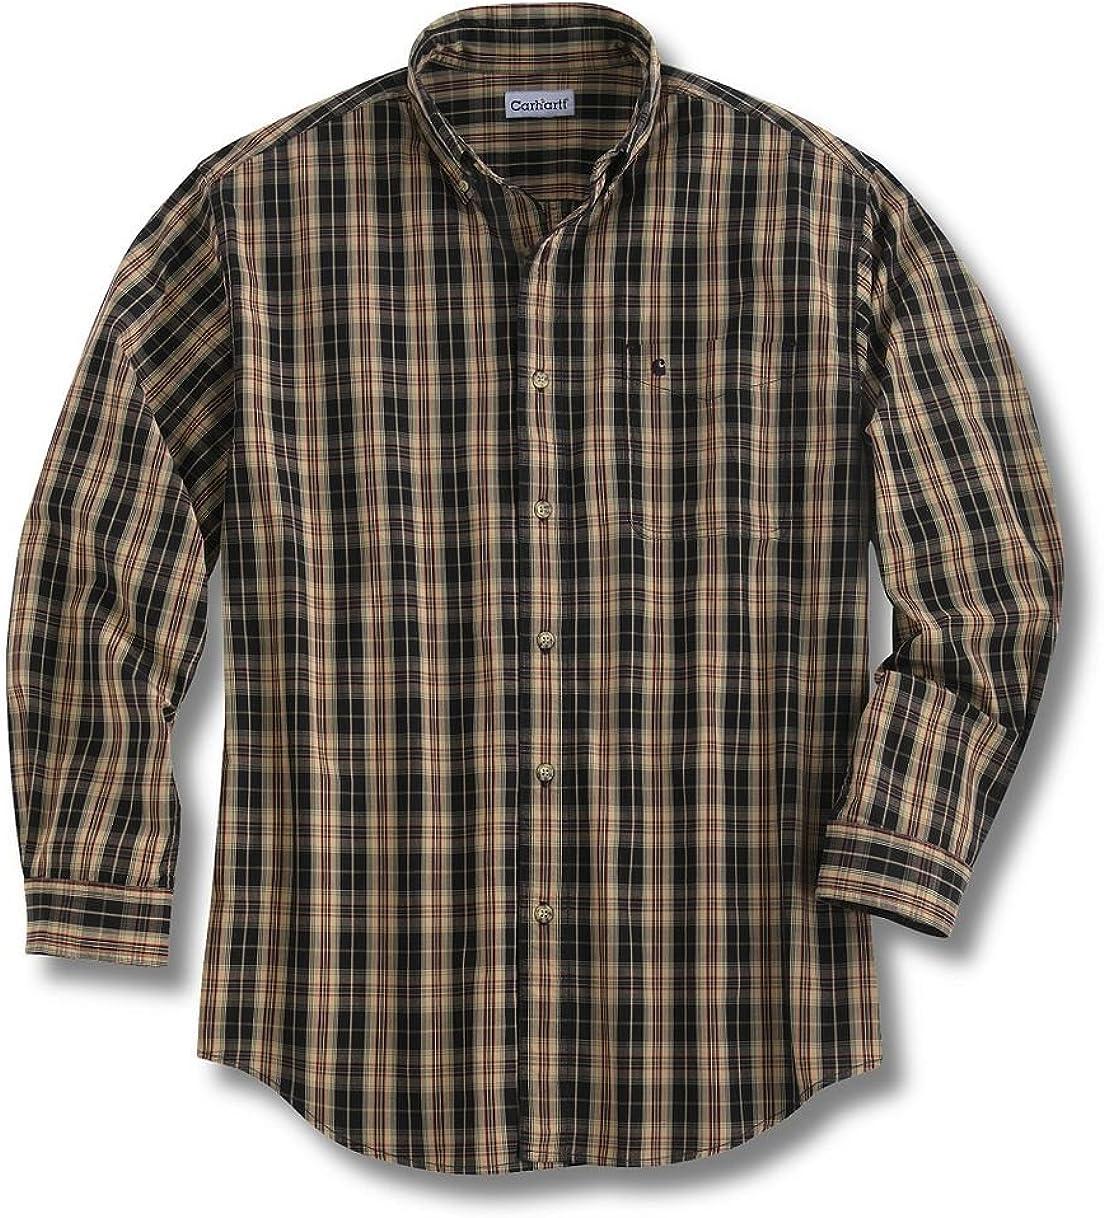 Carhartt Men's Long Sleeve Classic Plaid Shirt